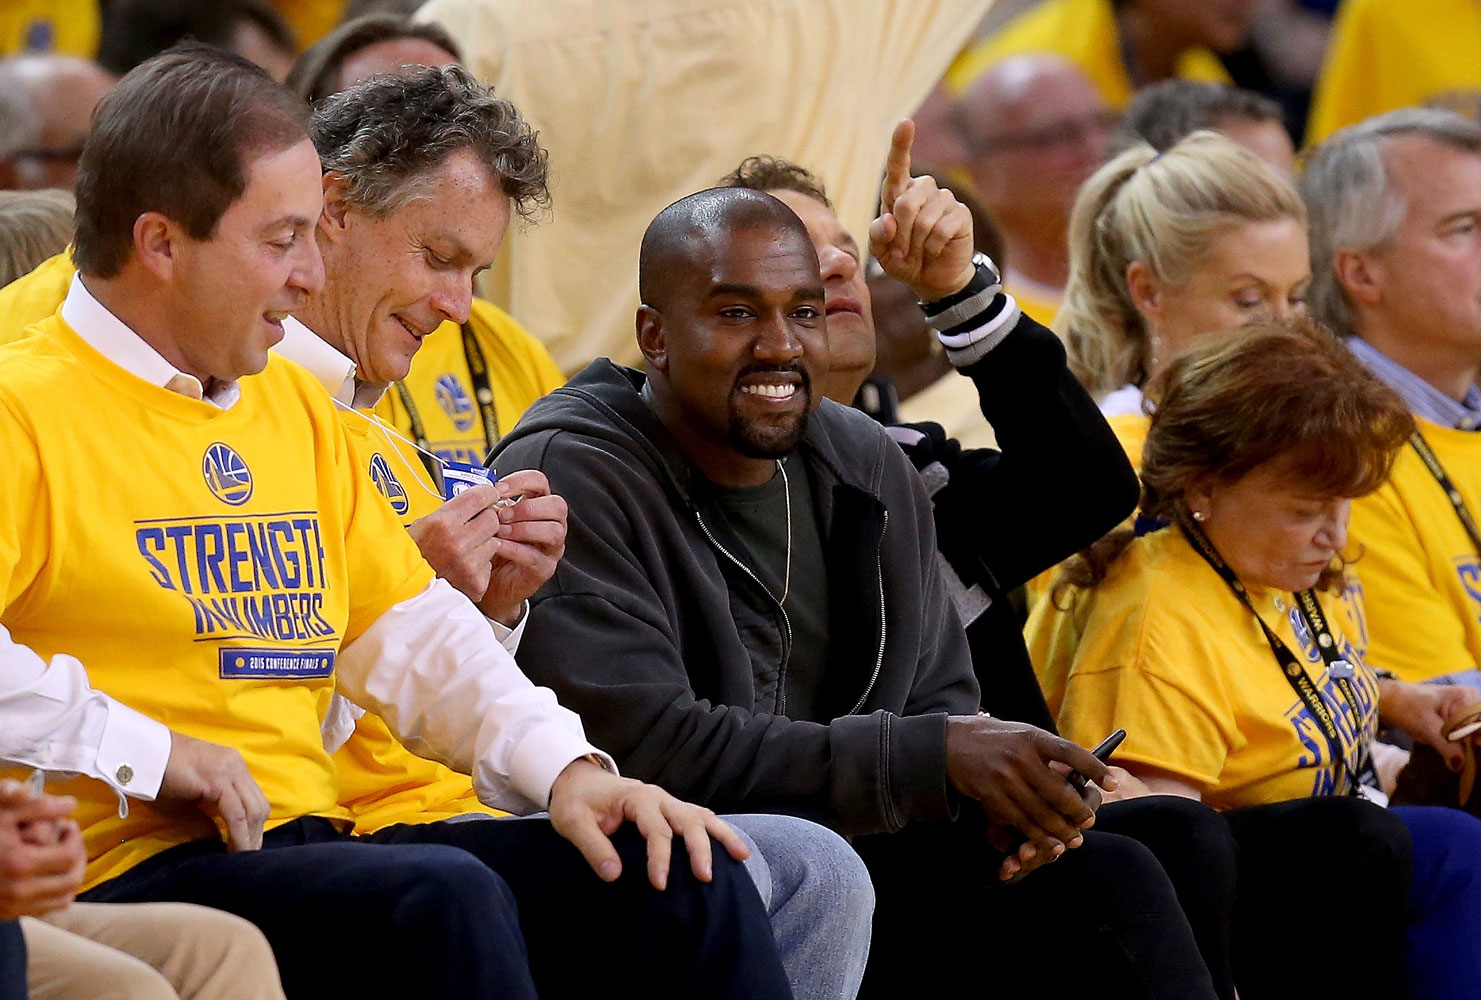 Miralos, Kanye West